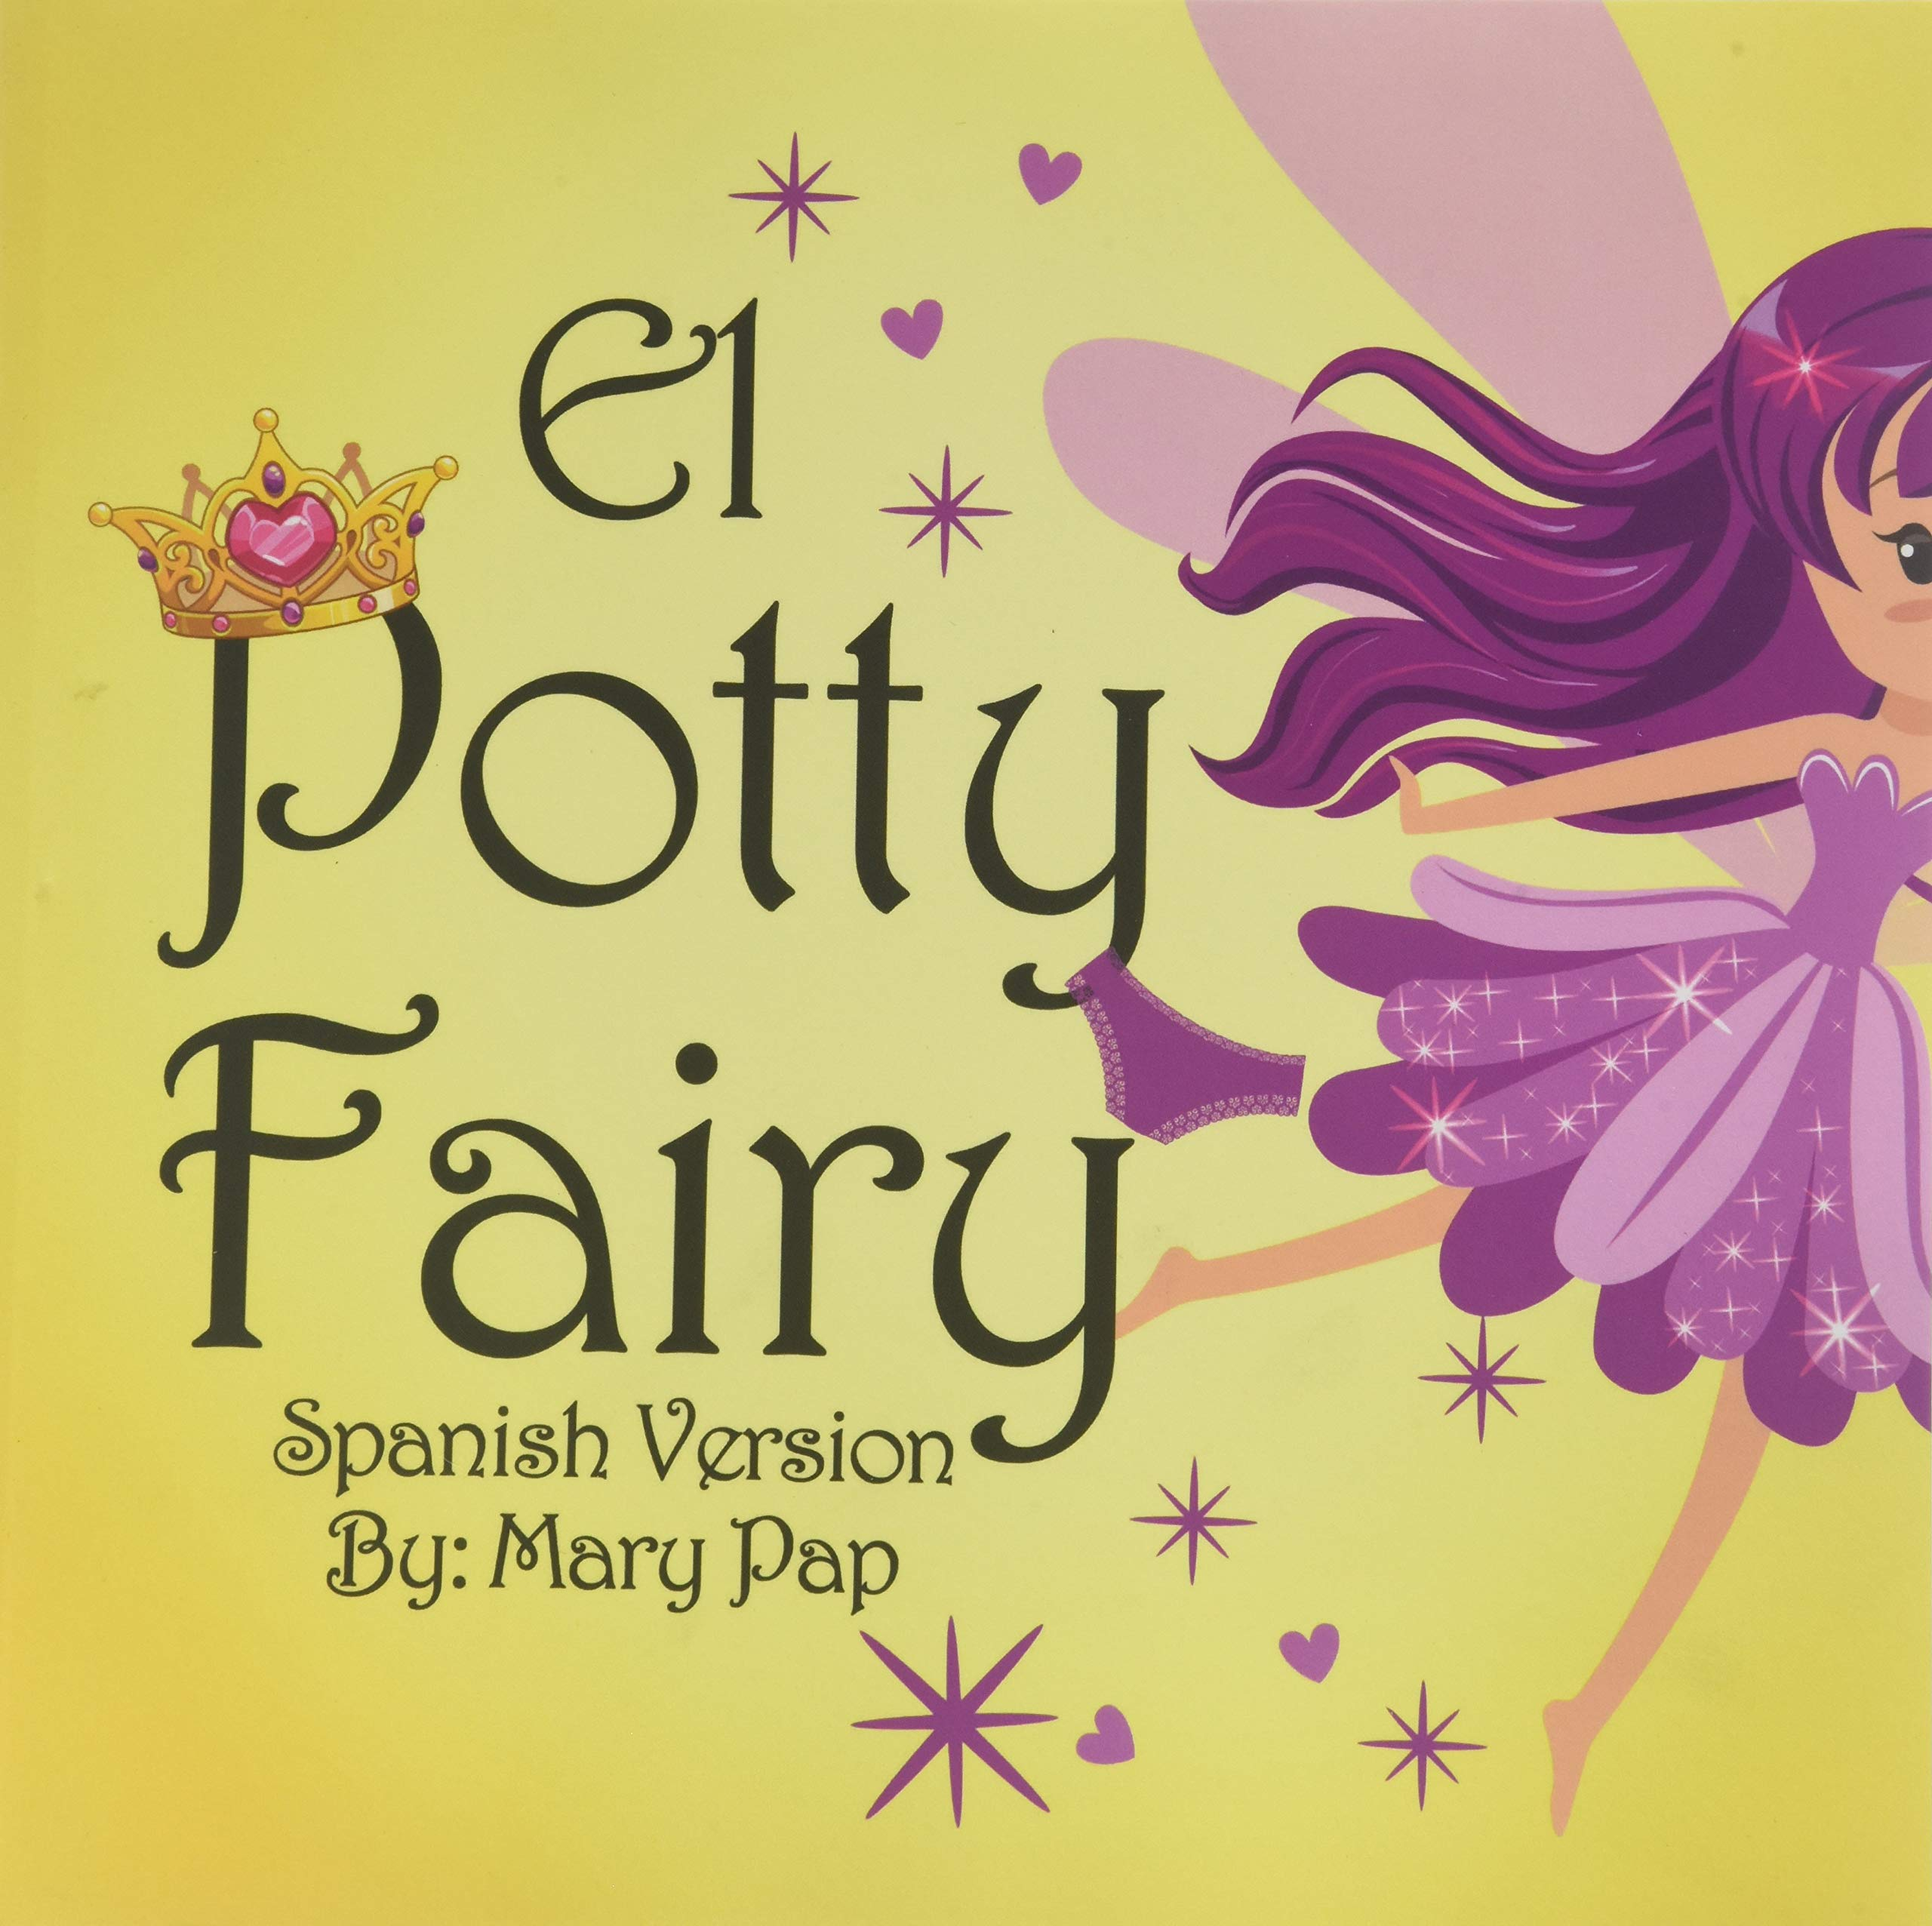 El Potty Fairy (Spanish Edition): Mary Pap: 9781545631744: Amazon.com: Books